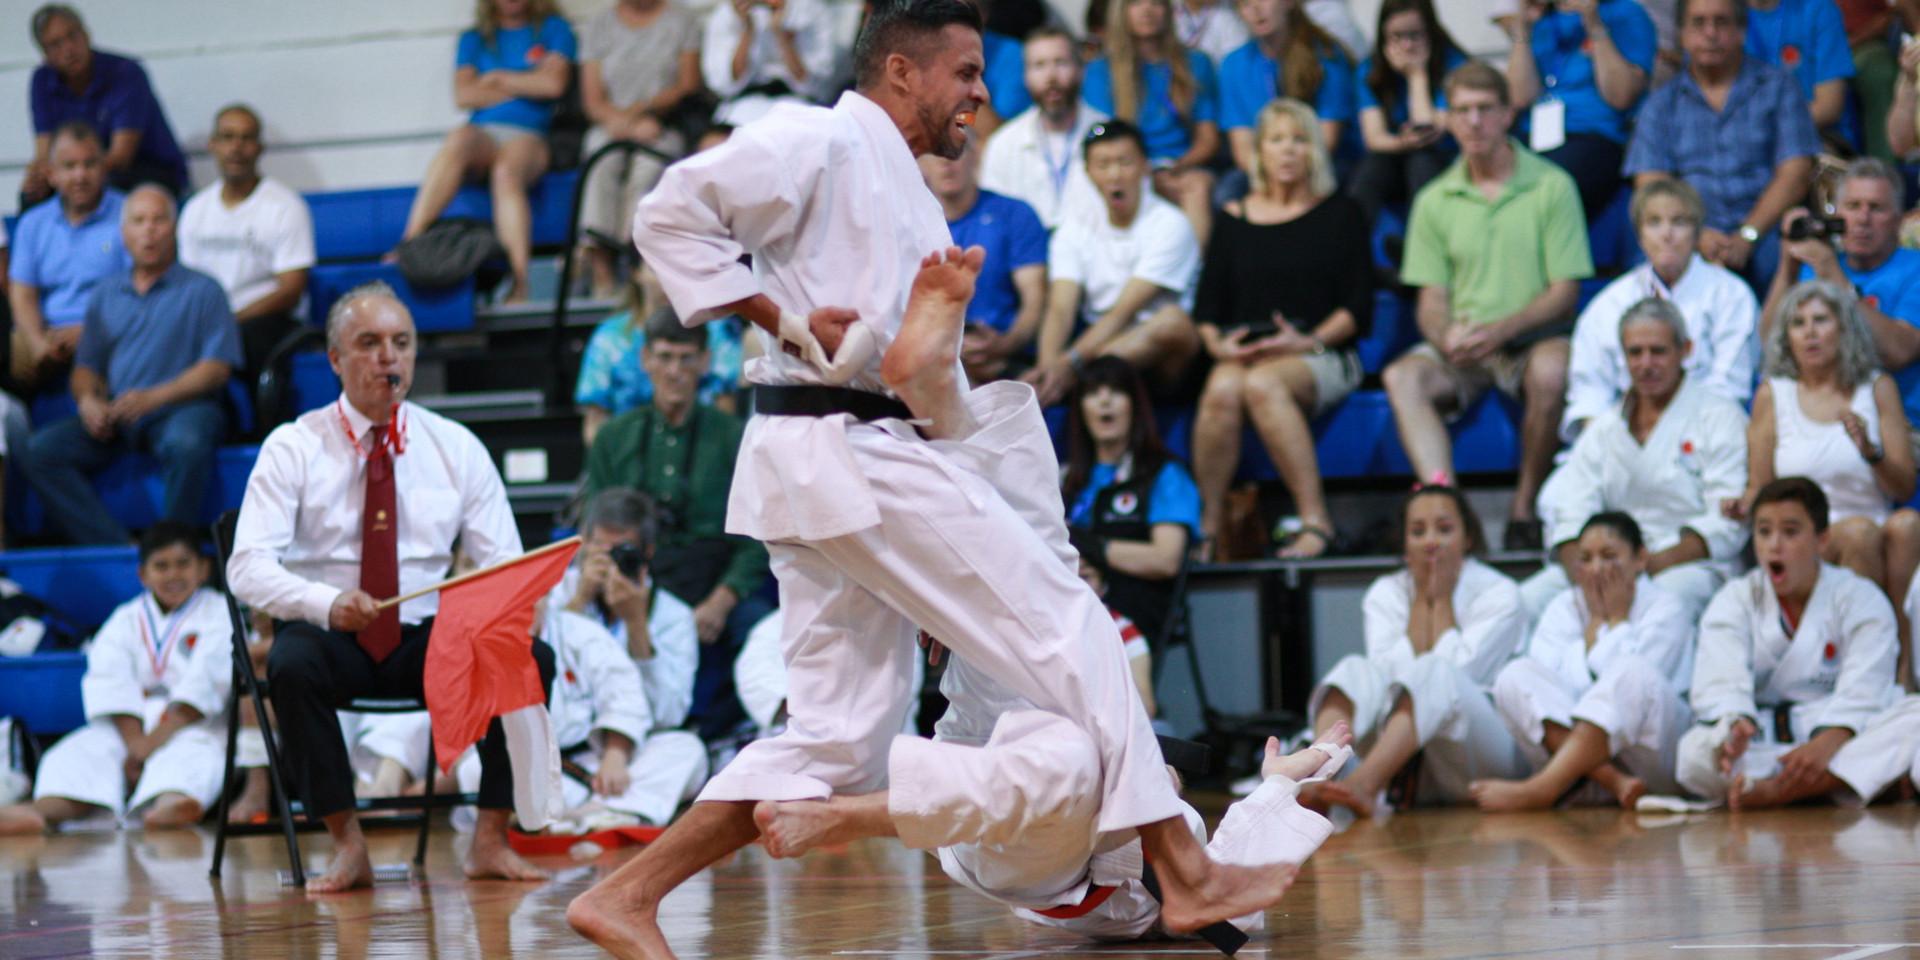 EPride_KaratePics-115.jpg